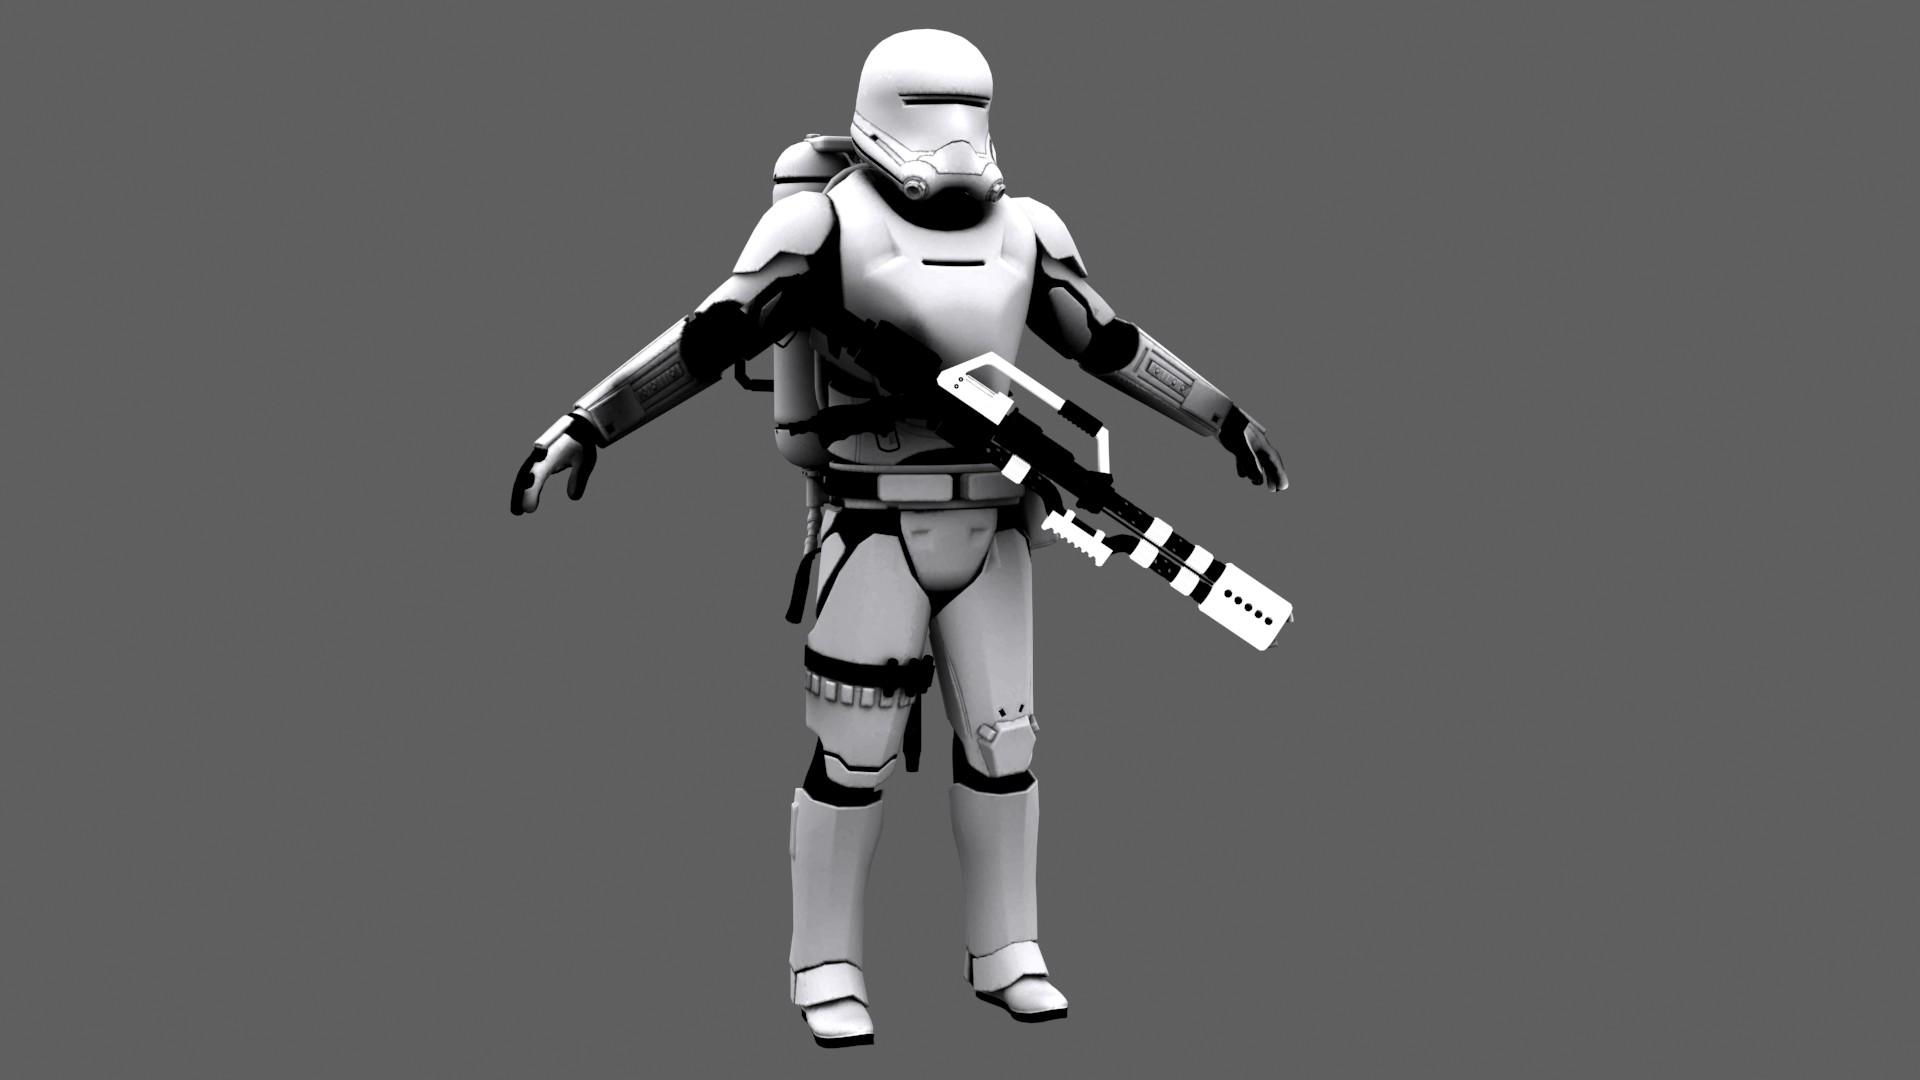 … Star Wars Force Awakens First Order FlameTrooper by JakeGreen163